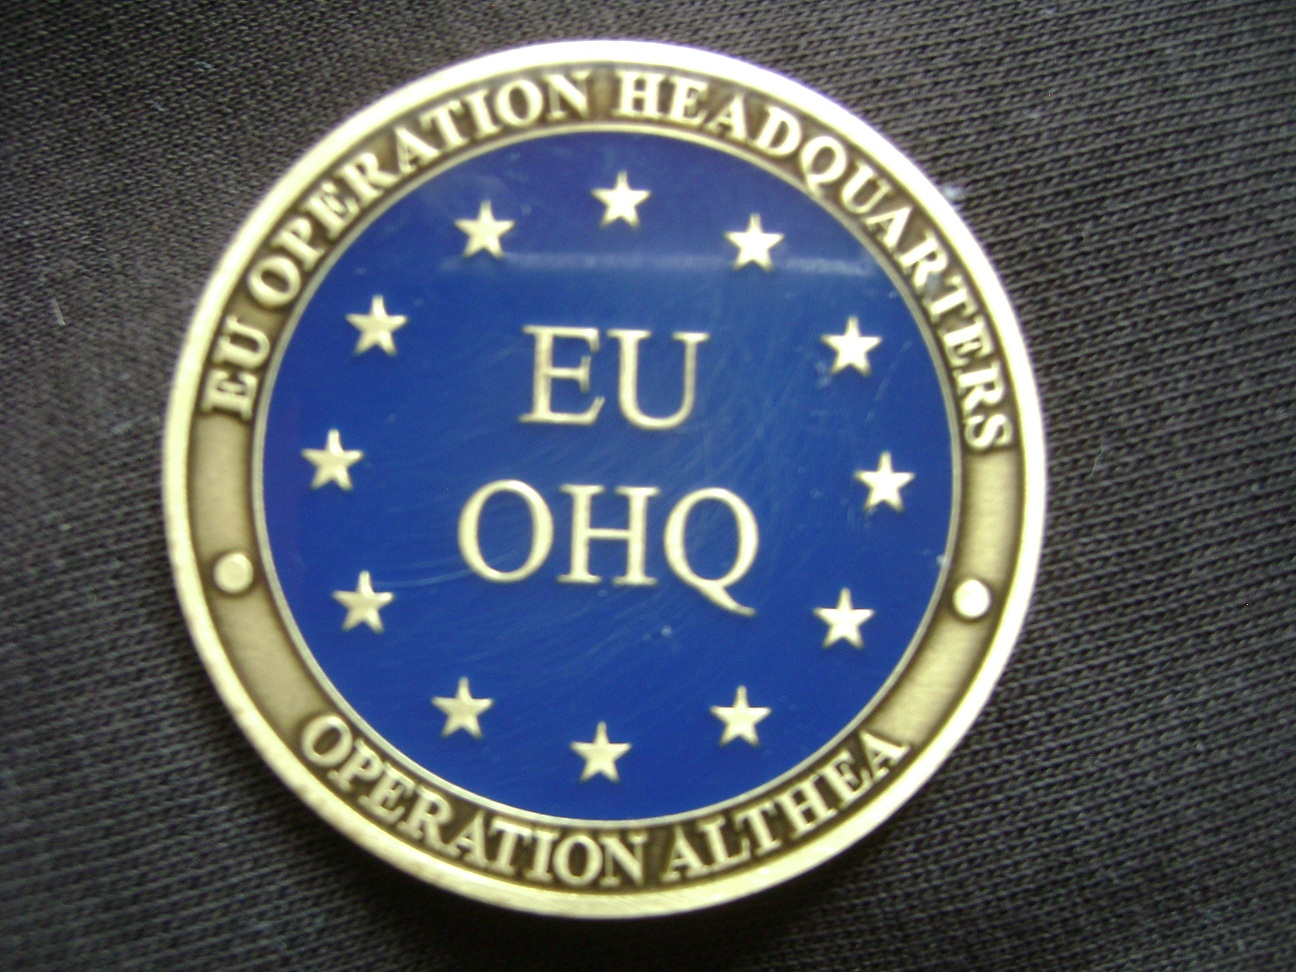 Coin_EU_OHQ_1.JPG